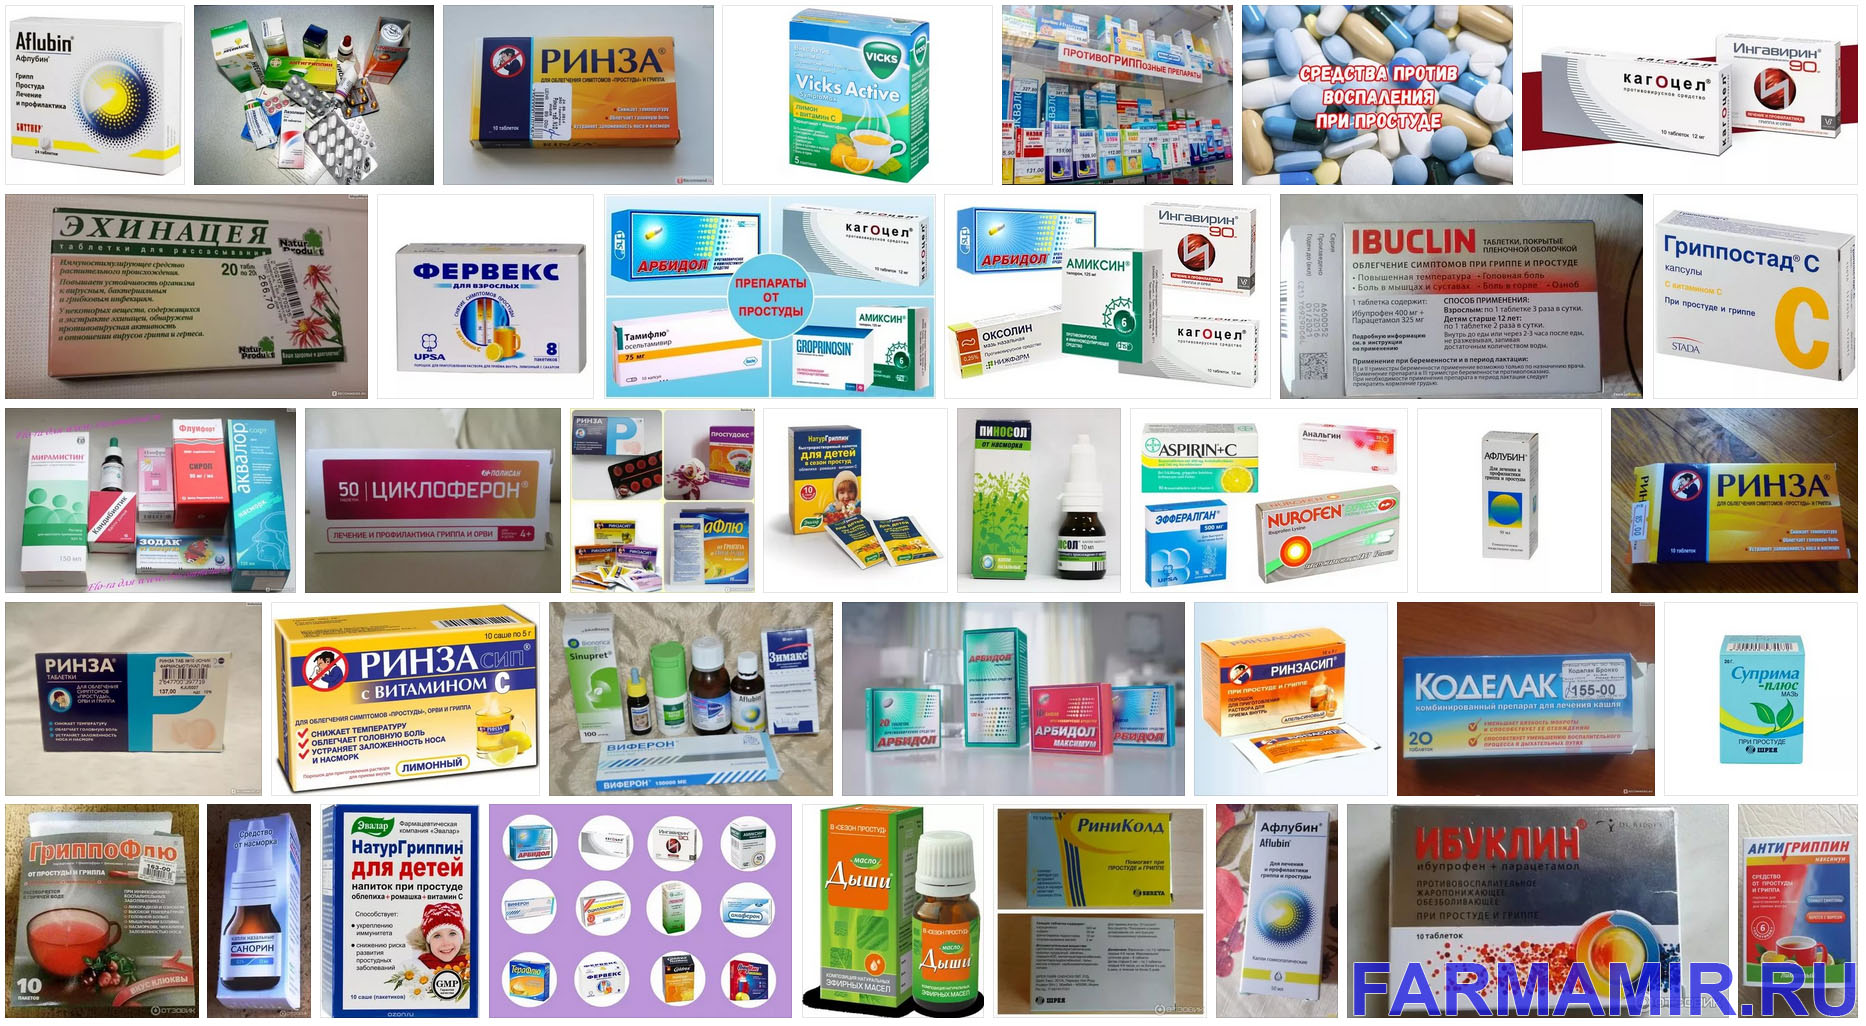 препараты при простуде коллаж